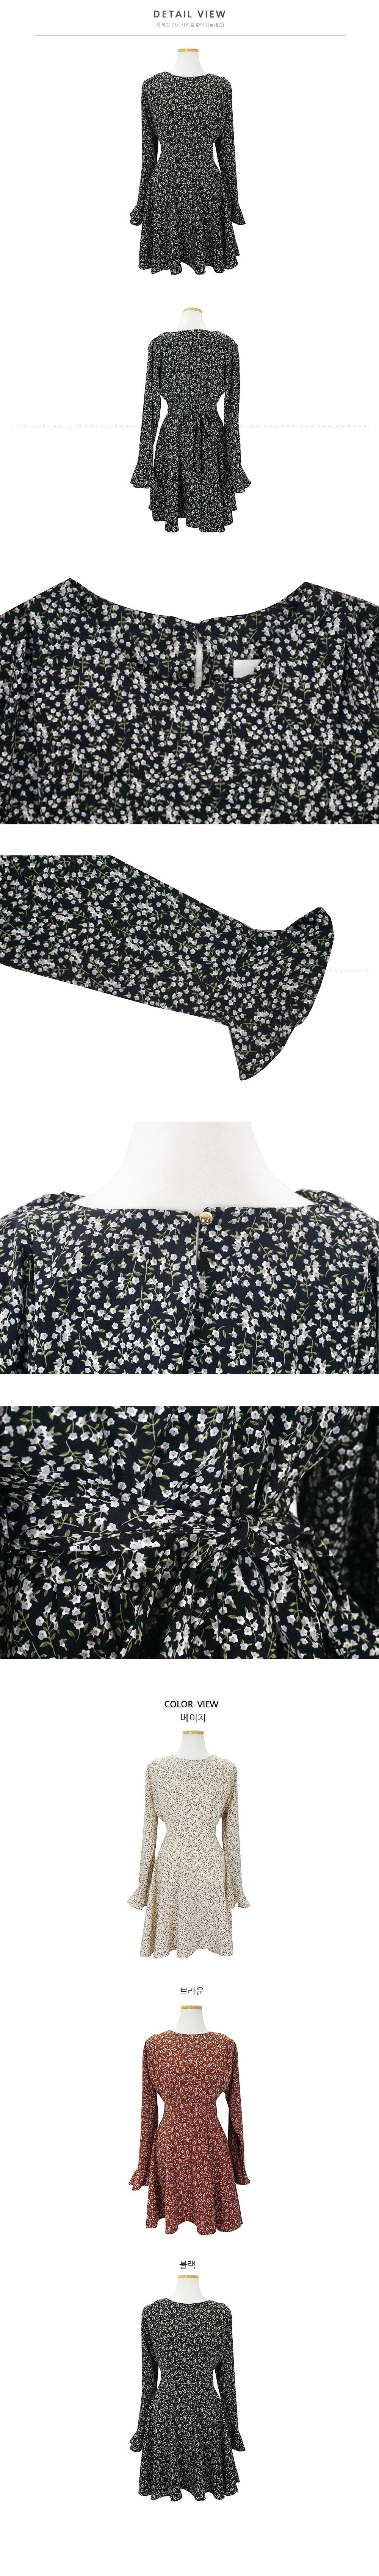 Cup flower ruffle ruffle mini dress 3color